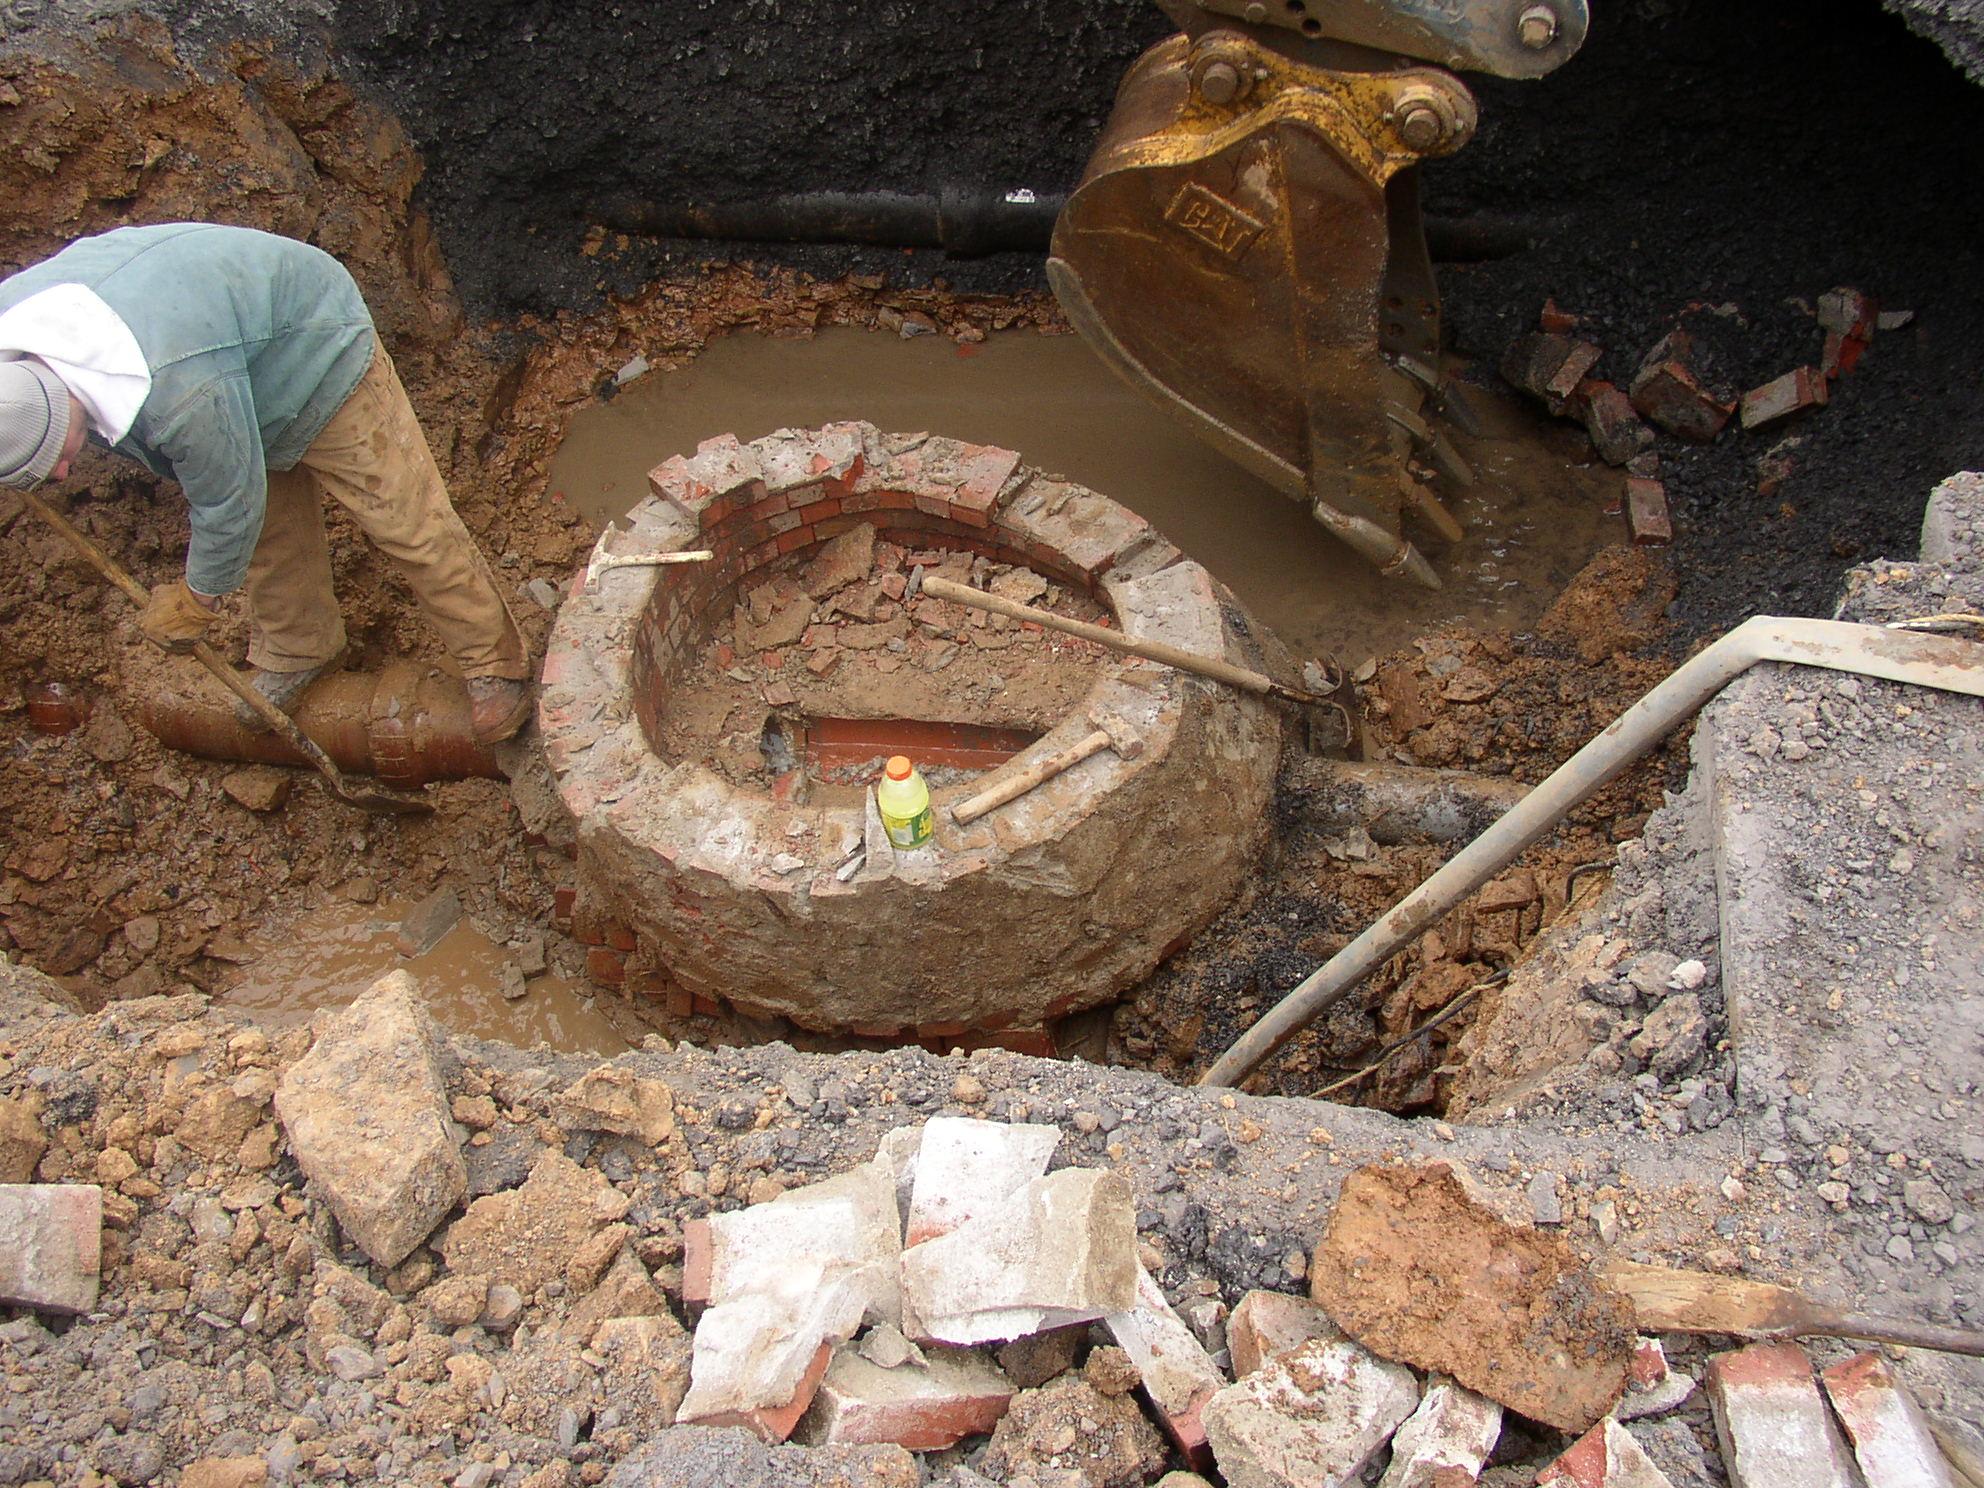 Manhole Removal